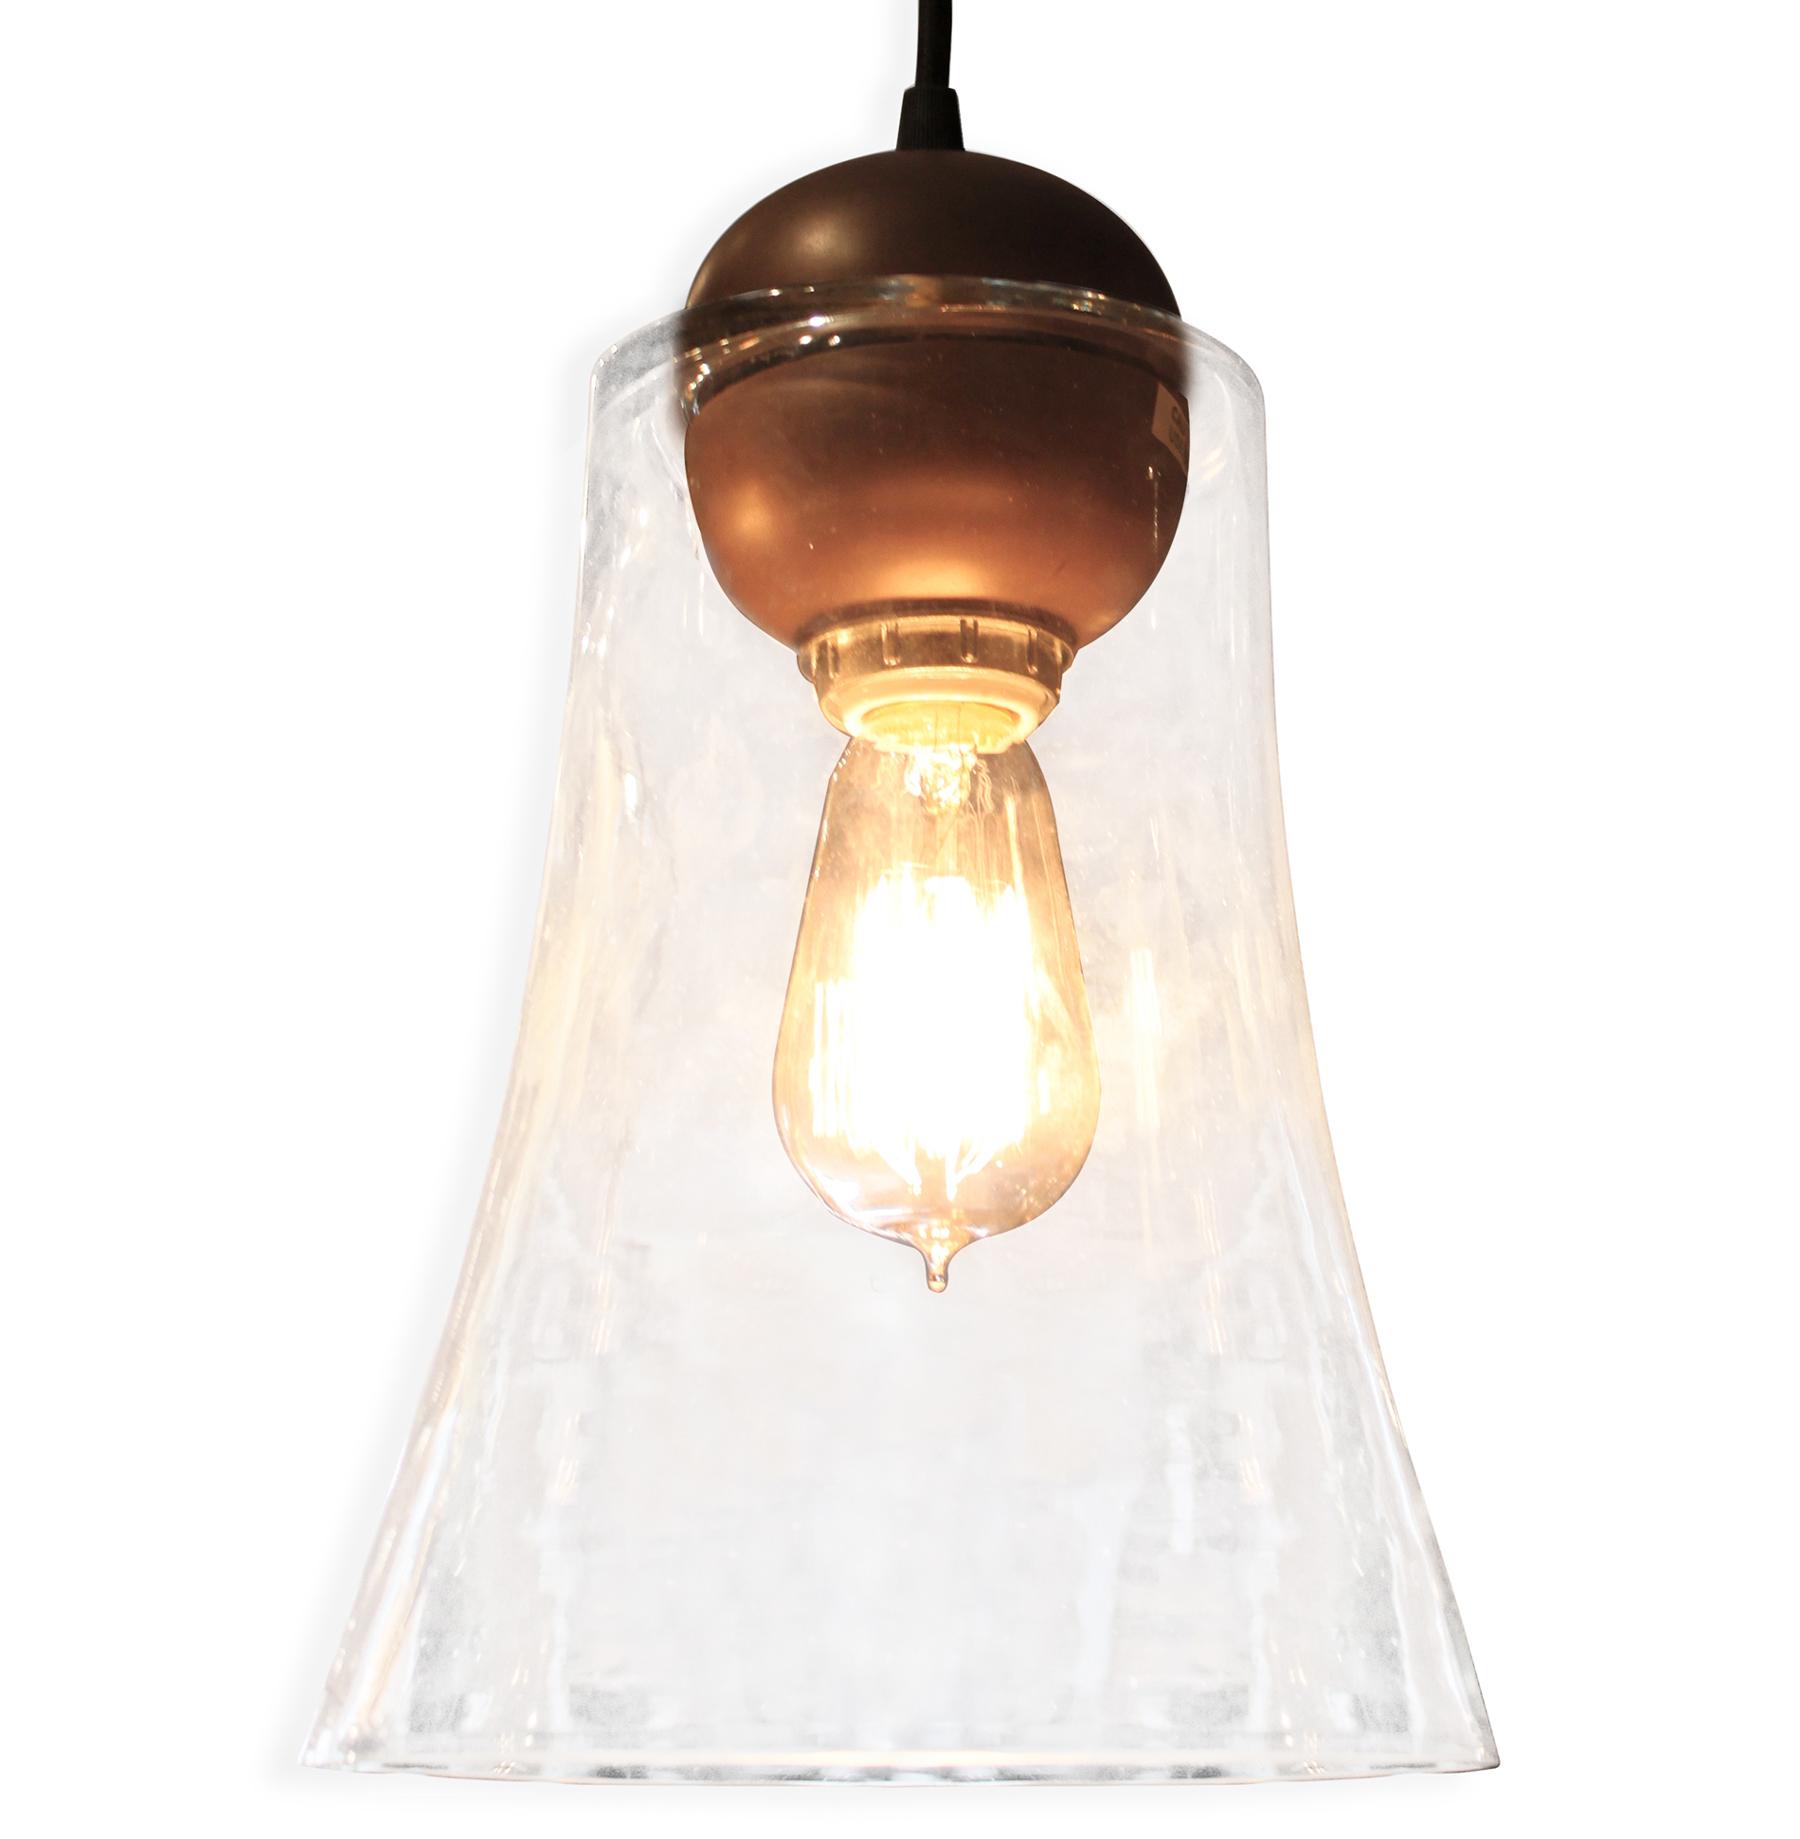 Messina Industrial Loft Bronze Glass Pendant Light